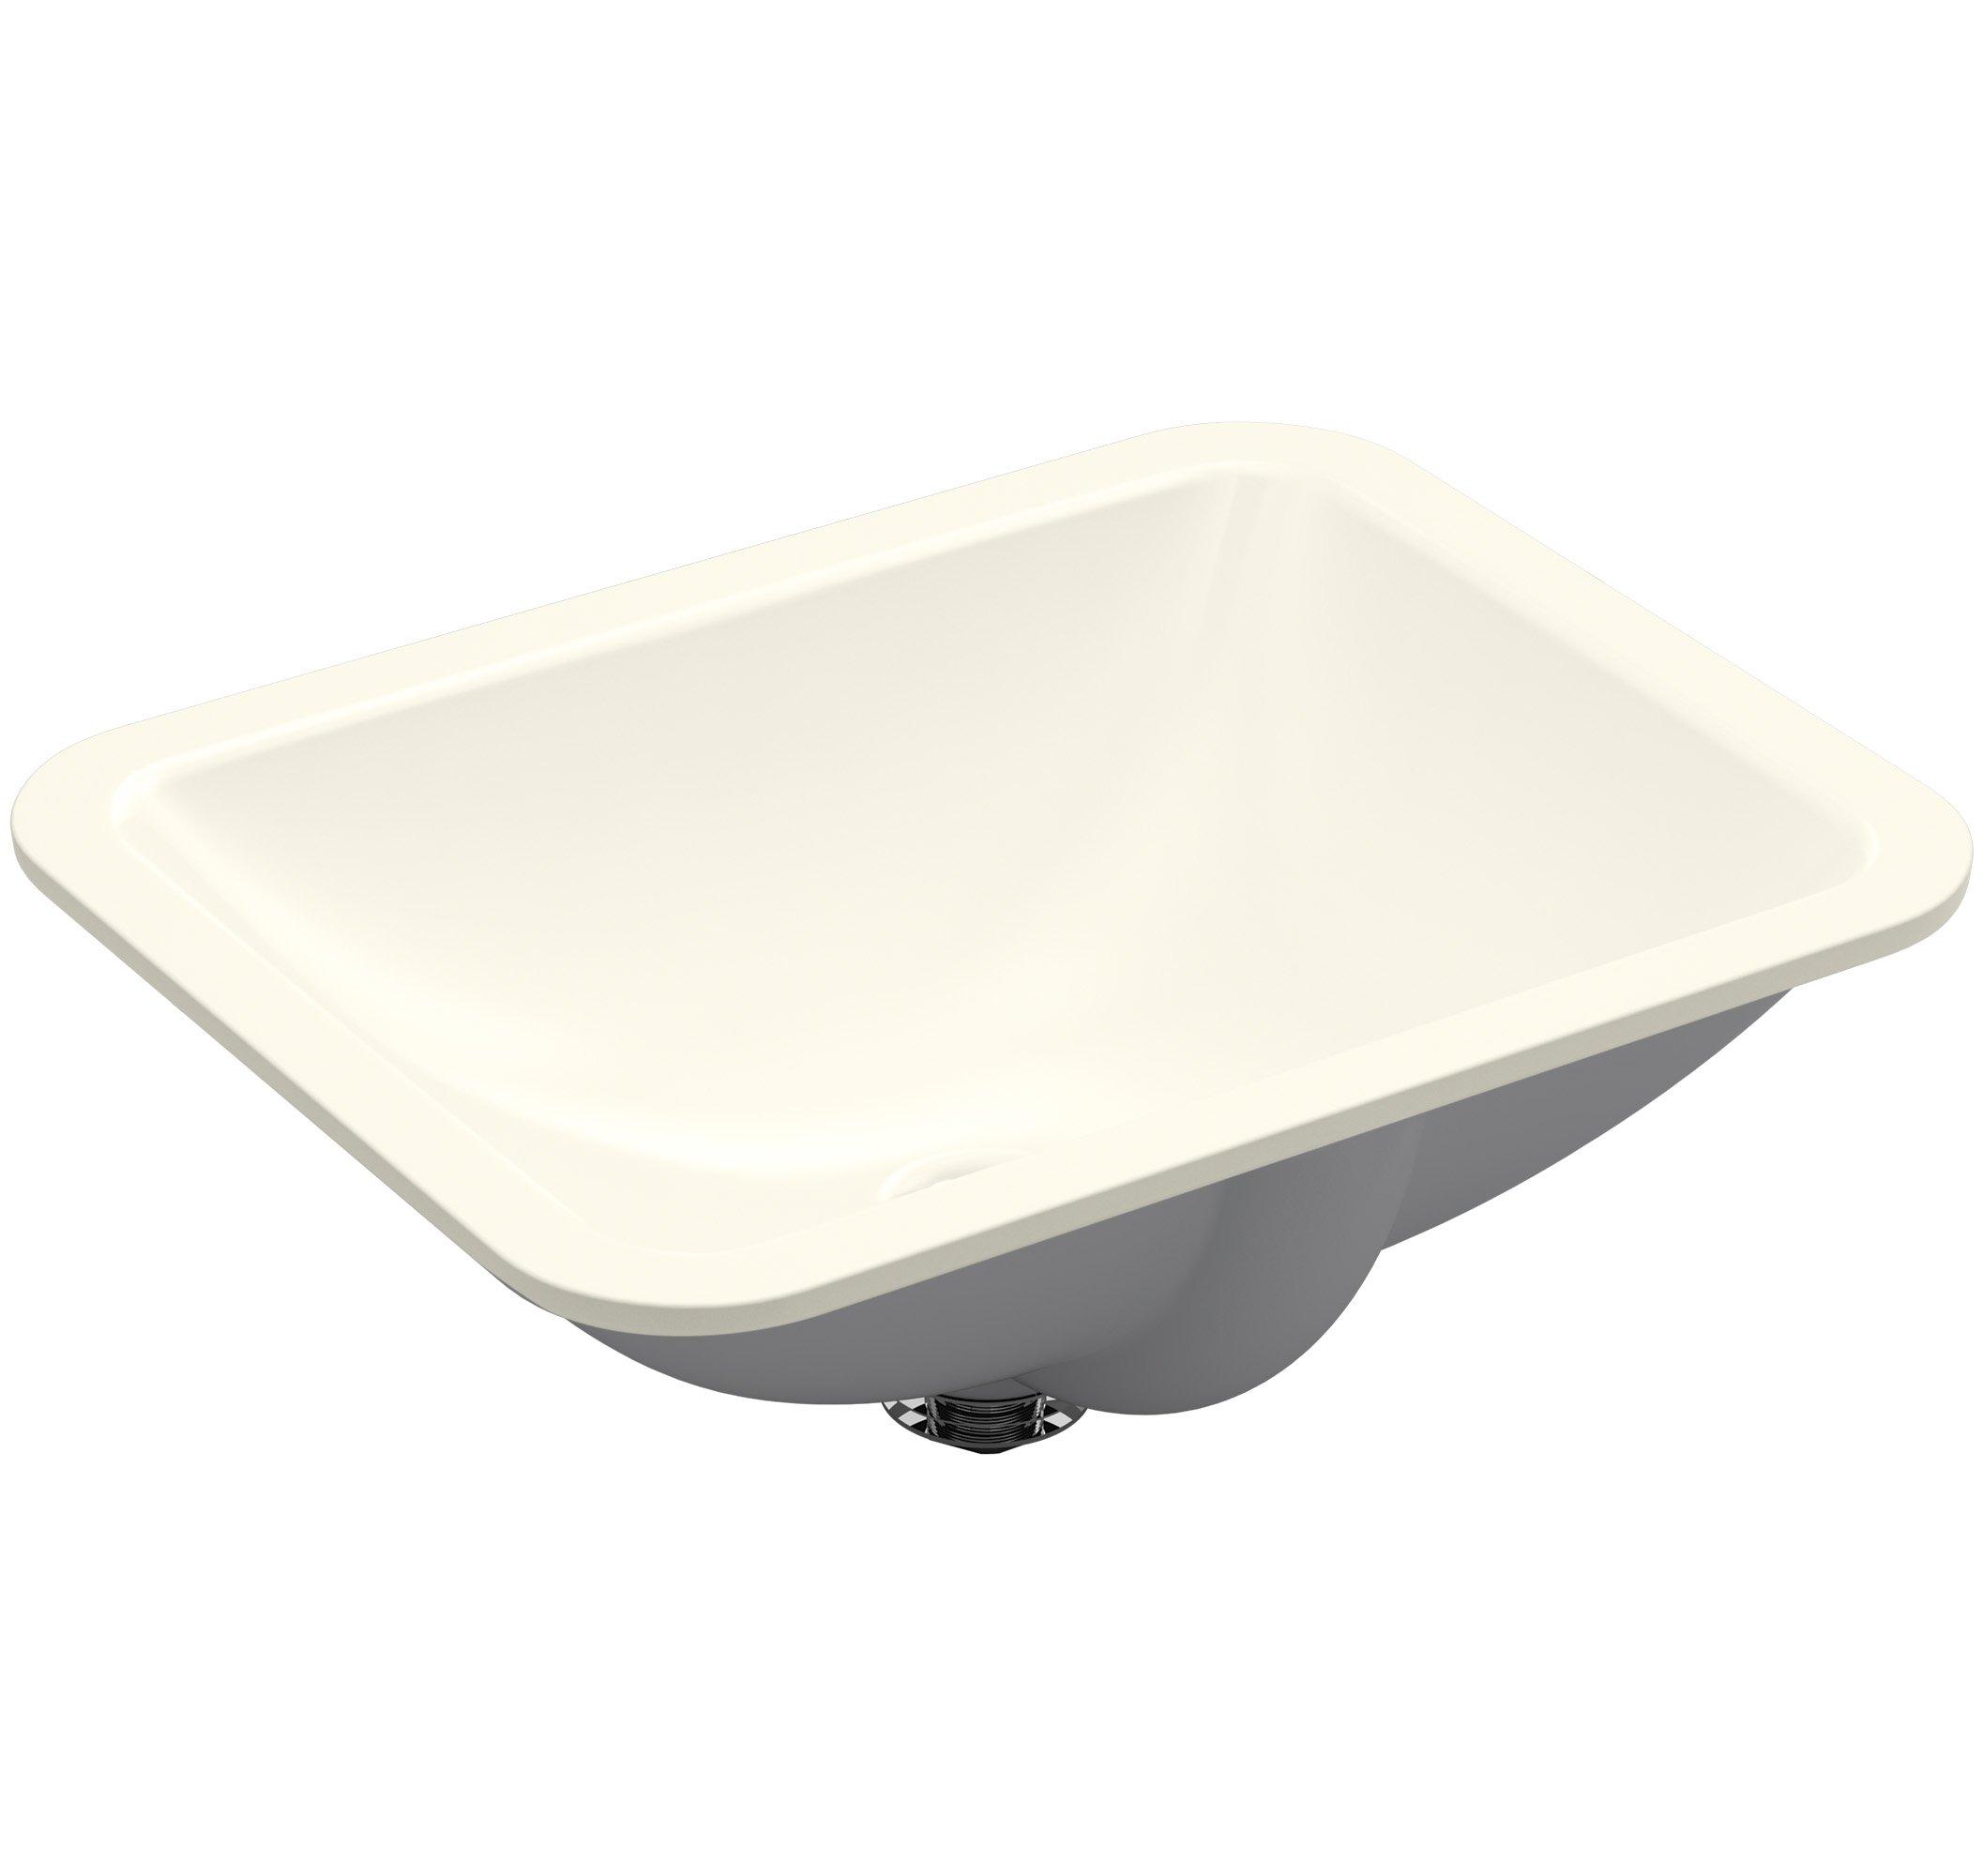 KOHLER K-20000-96 Caxton Rectangle 20-5/16 x 15-3/4 In. Undermount Bathroom Sink, Biscuit